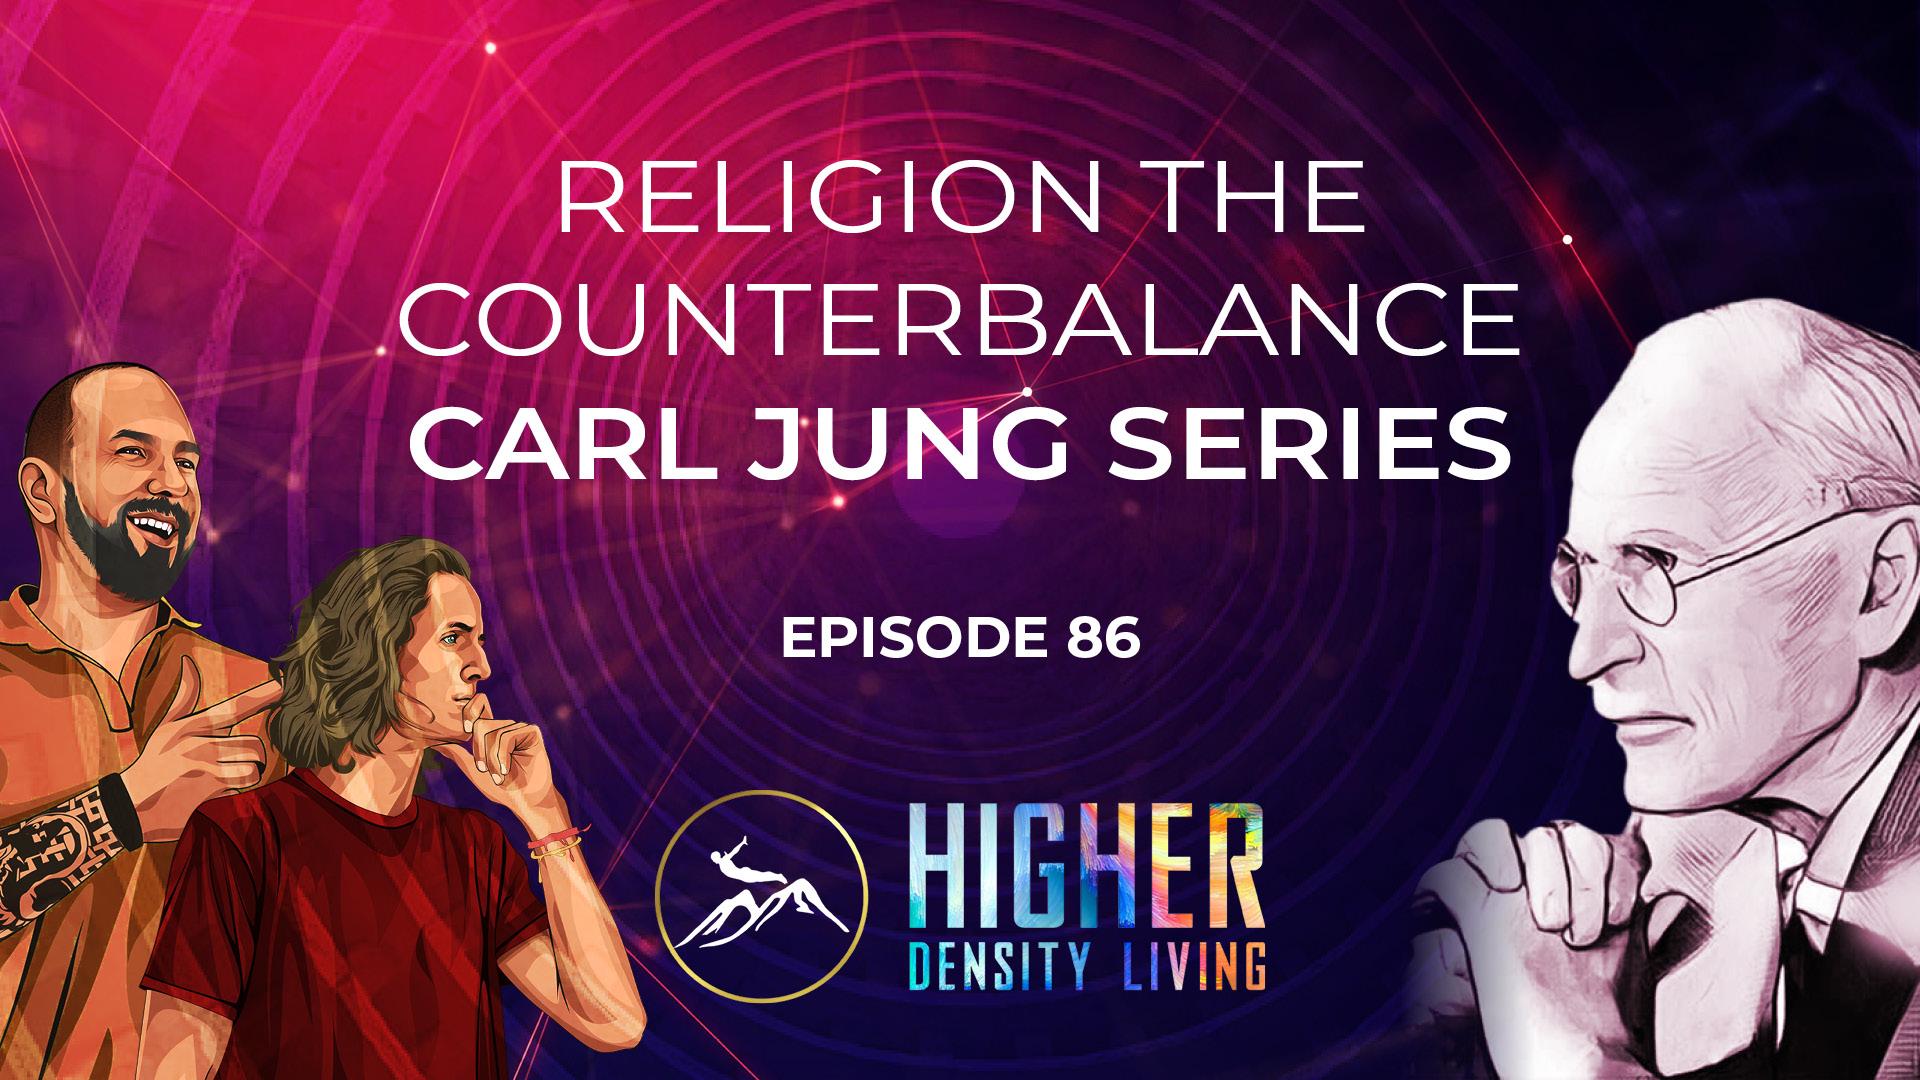 Religion the Counterbalance